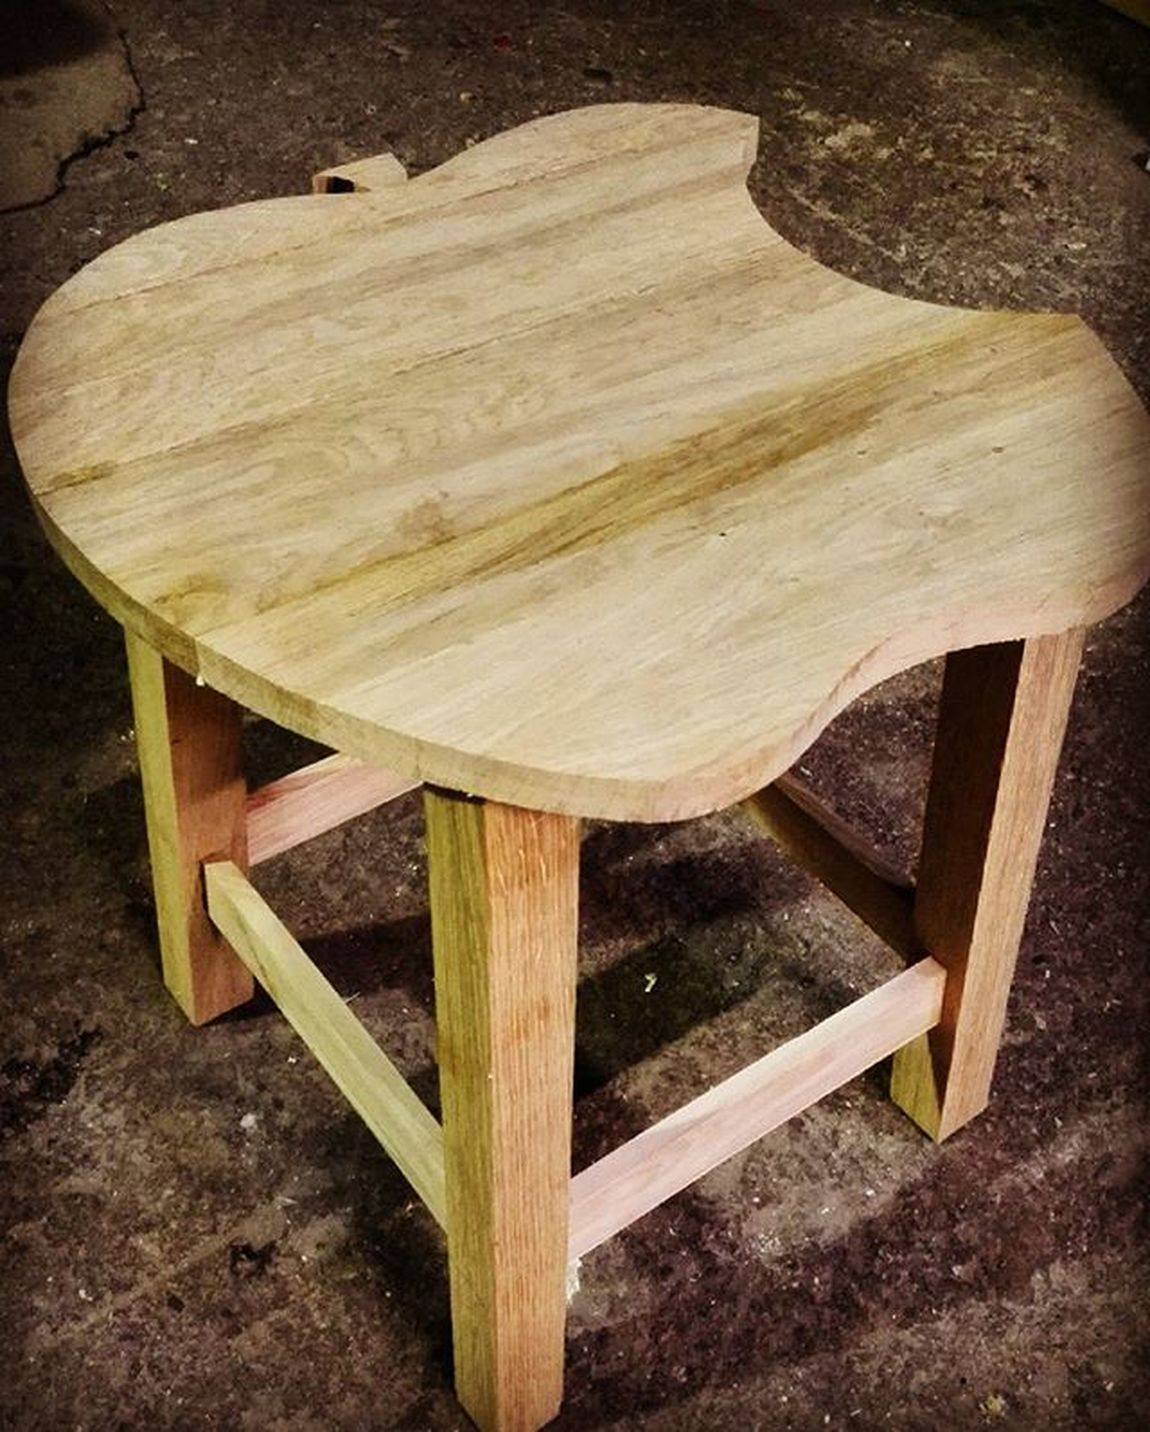 Apple Applestool DIY Wood Woodworking табуреткасвоимируками табуретка своимируками